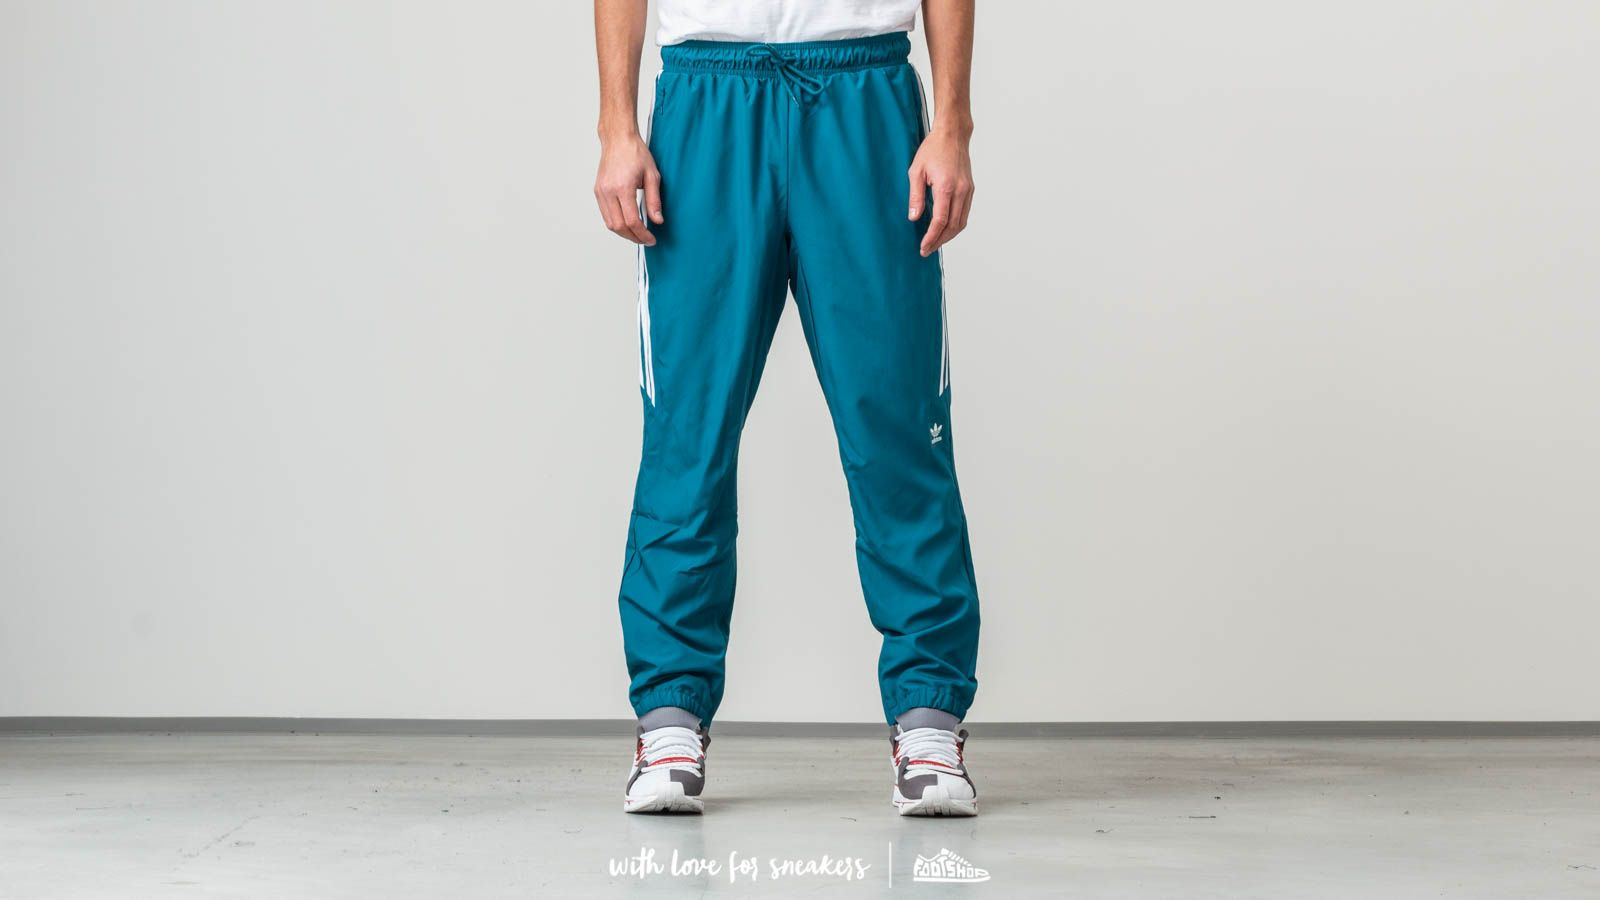 adidas Classic Wind Trackpants Real Teal/ White za skvělou cenu 1 130 Kč koupíte na Footshop.cz